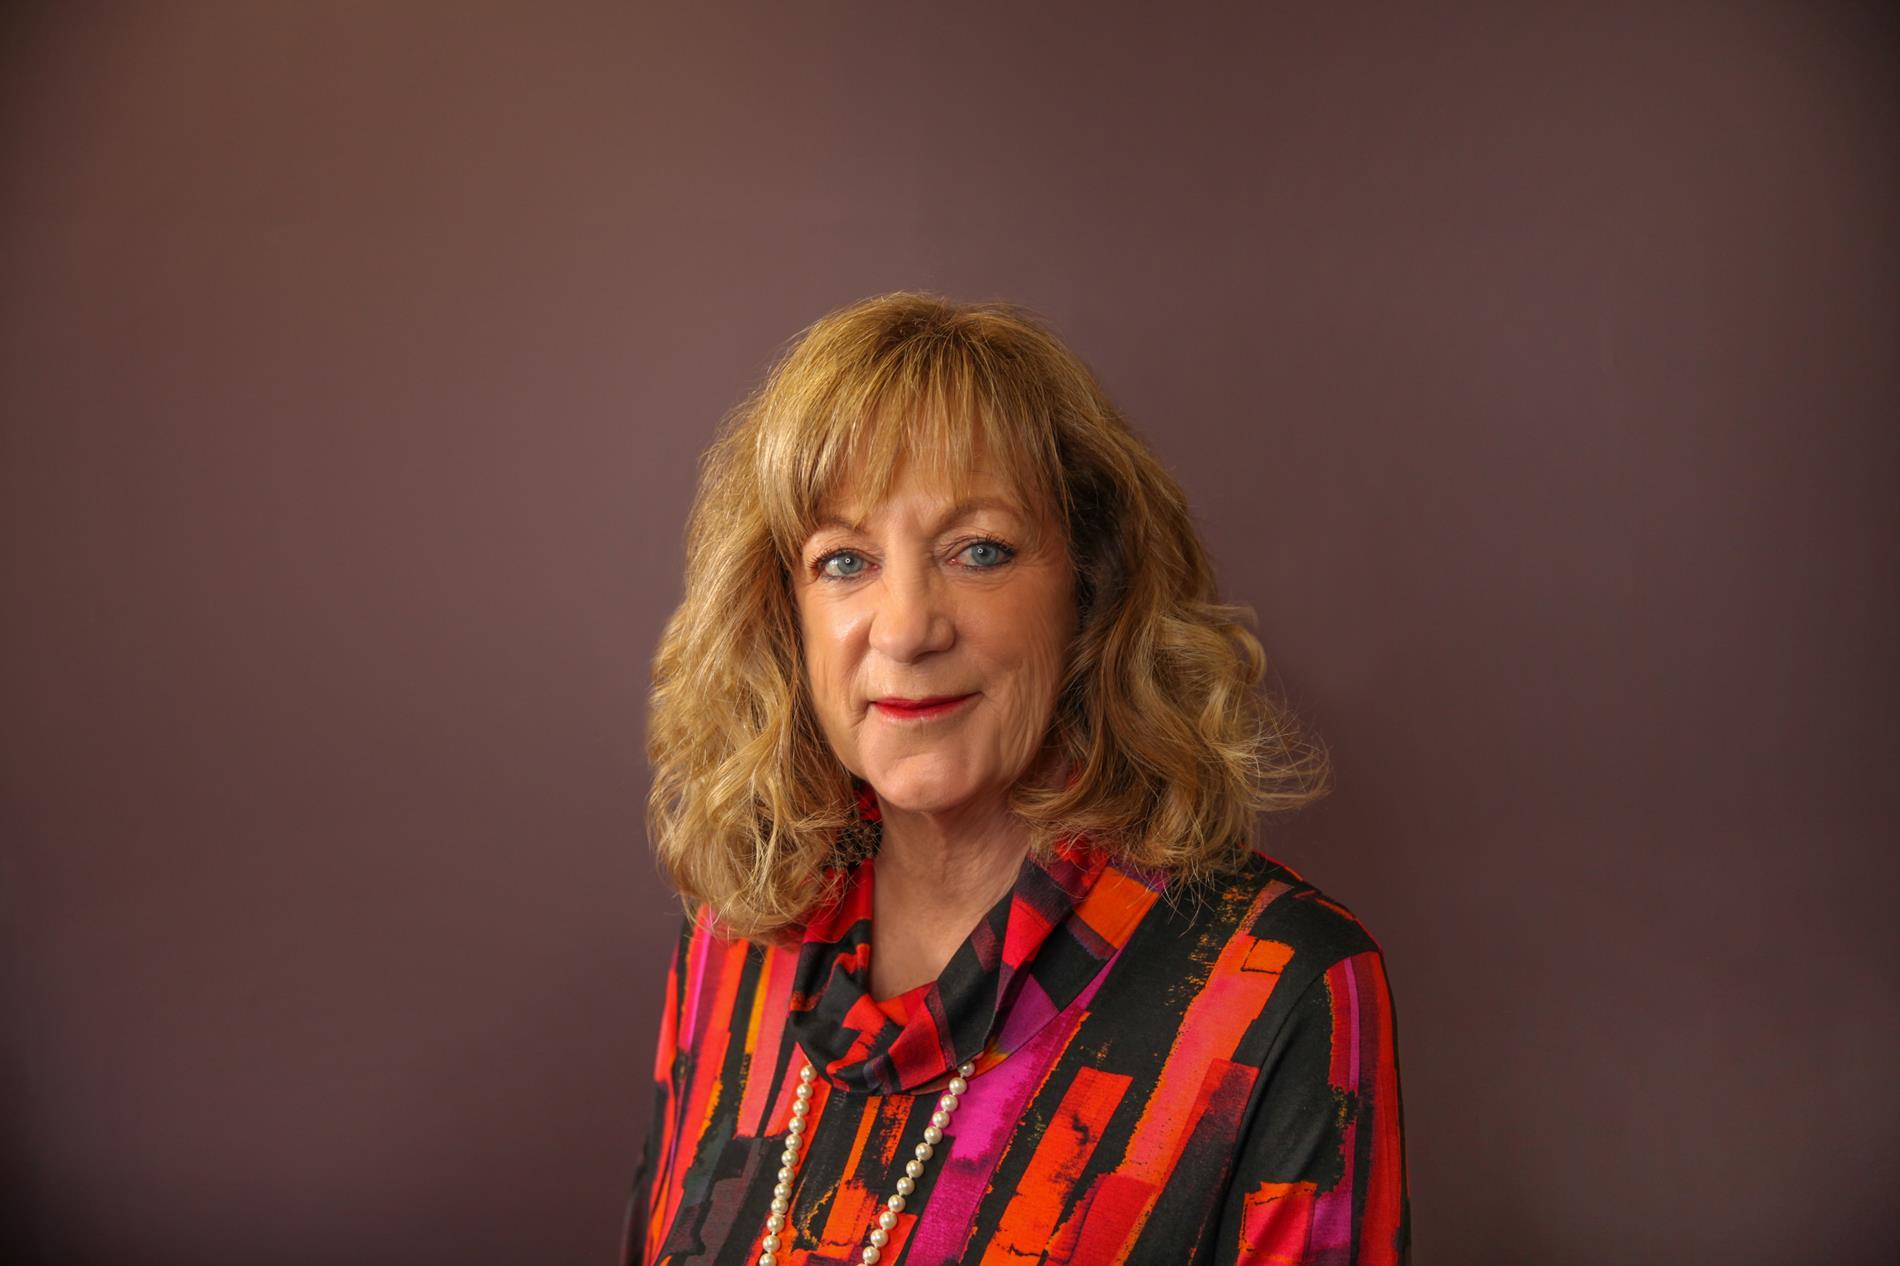 Linda-Housewright